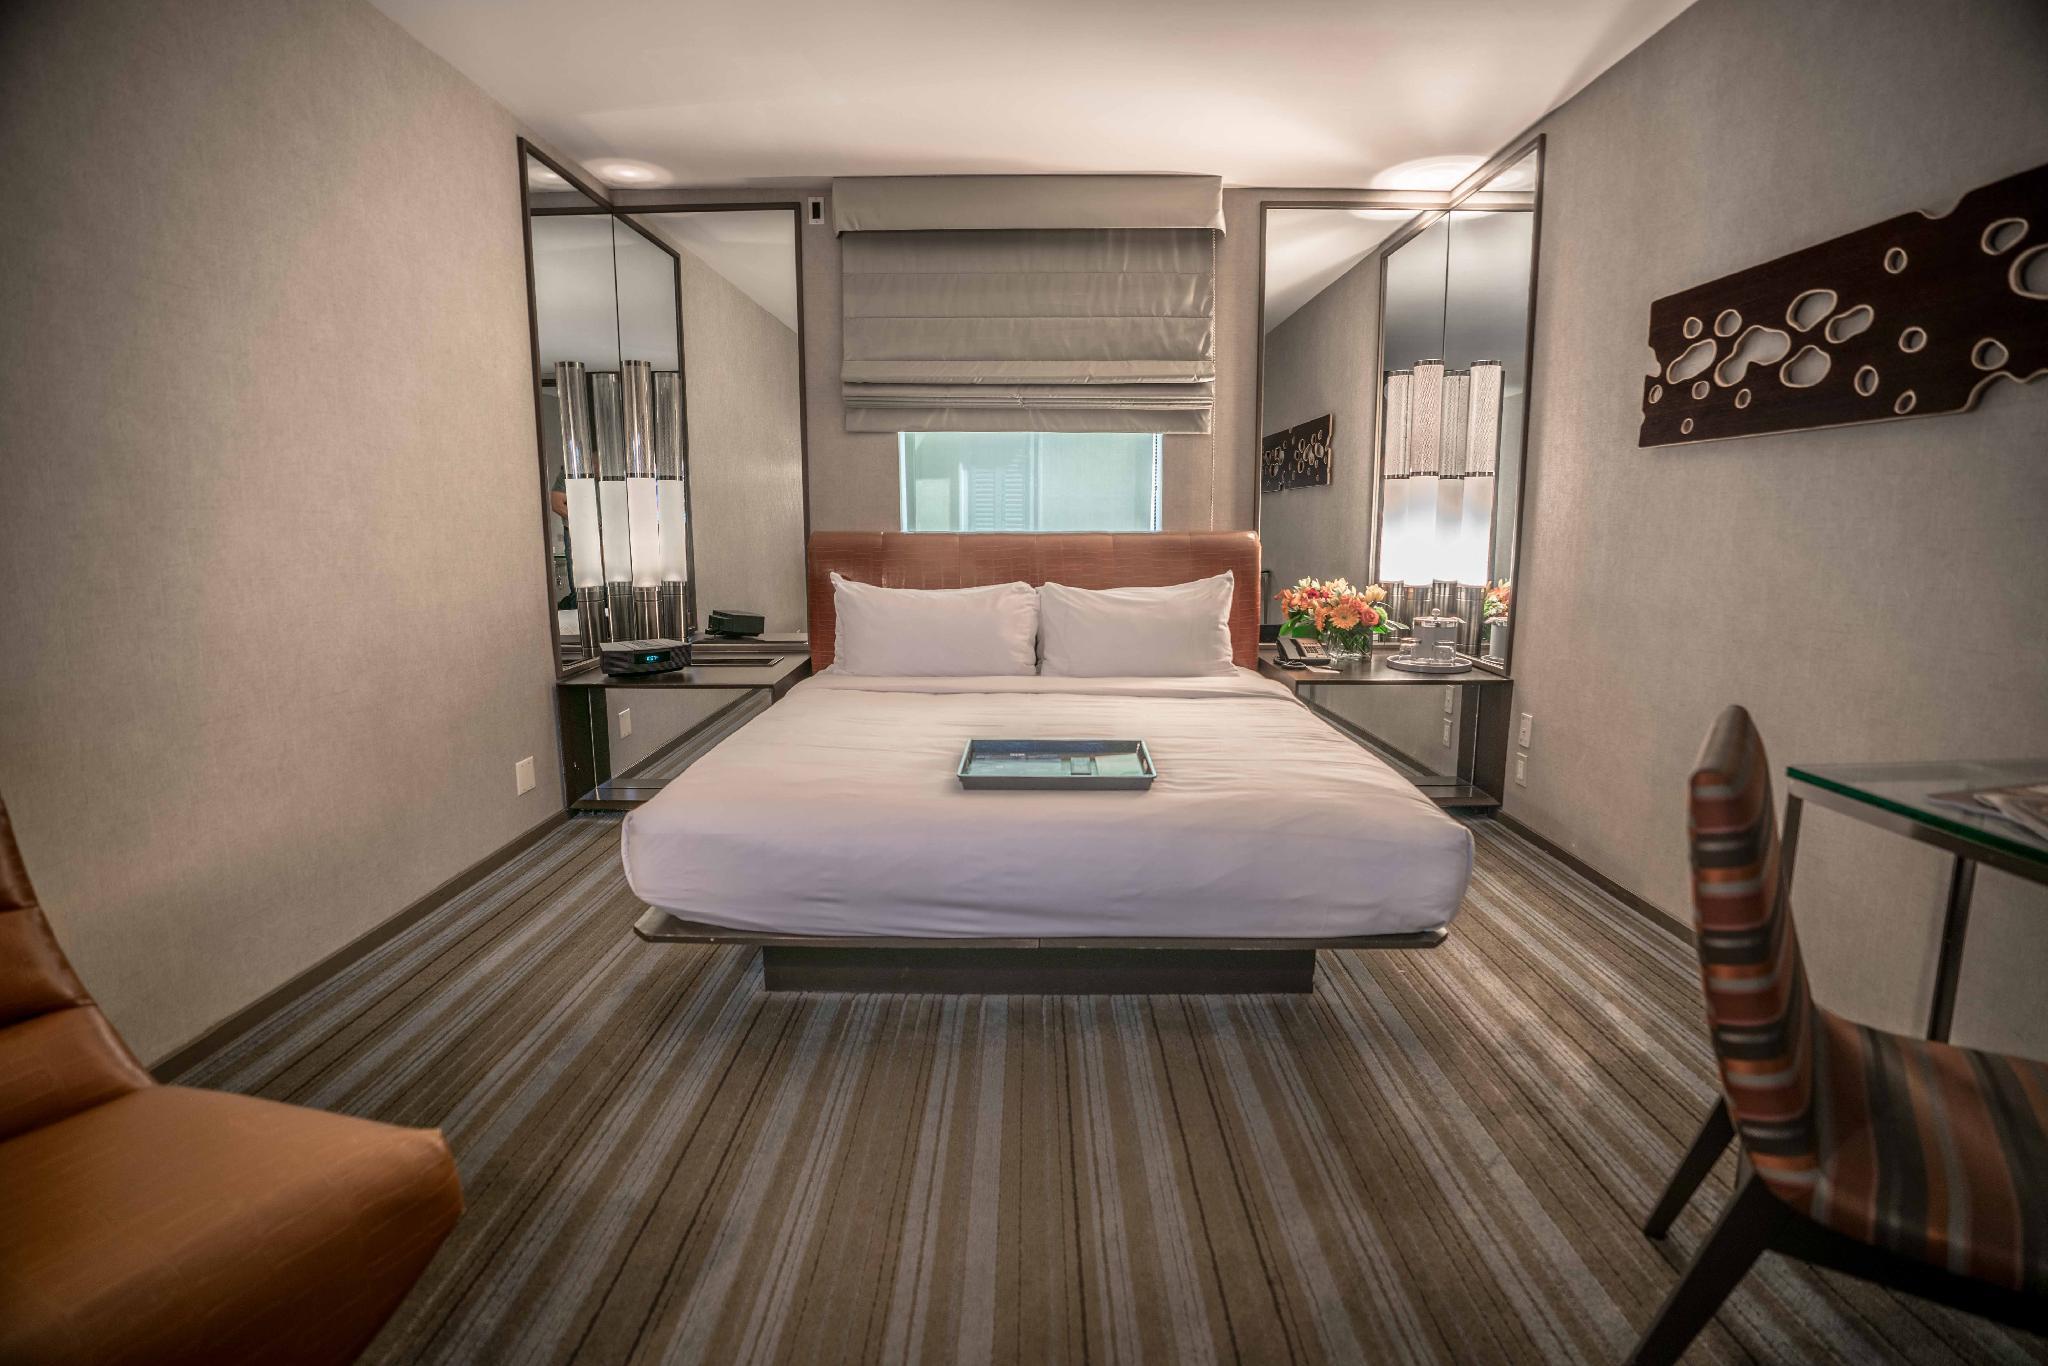 Mgm Grand Hotel And Casino Resort Las Vegas Nv Deals